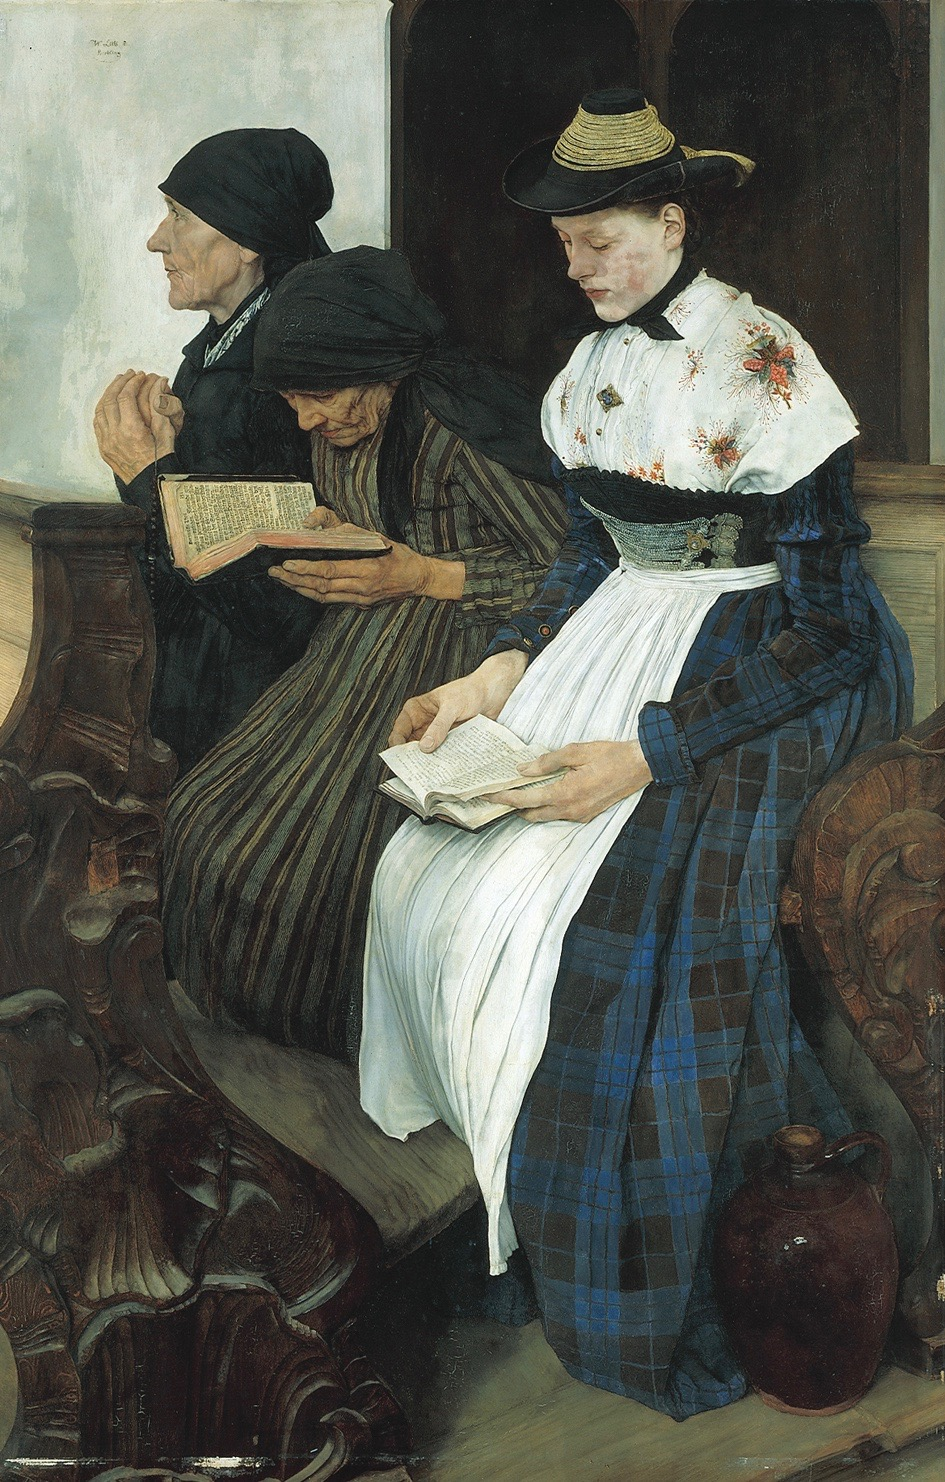 Three Women in Church, Wilhelm Leibl, 1881, 44 x 30 in, oil on wood